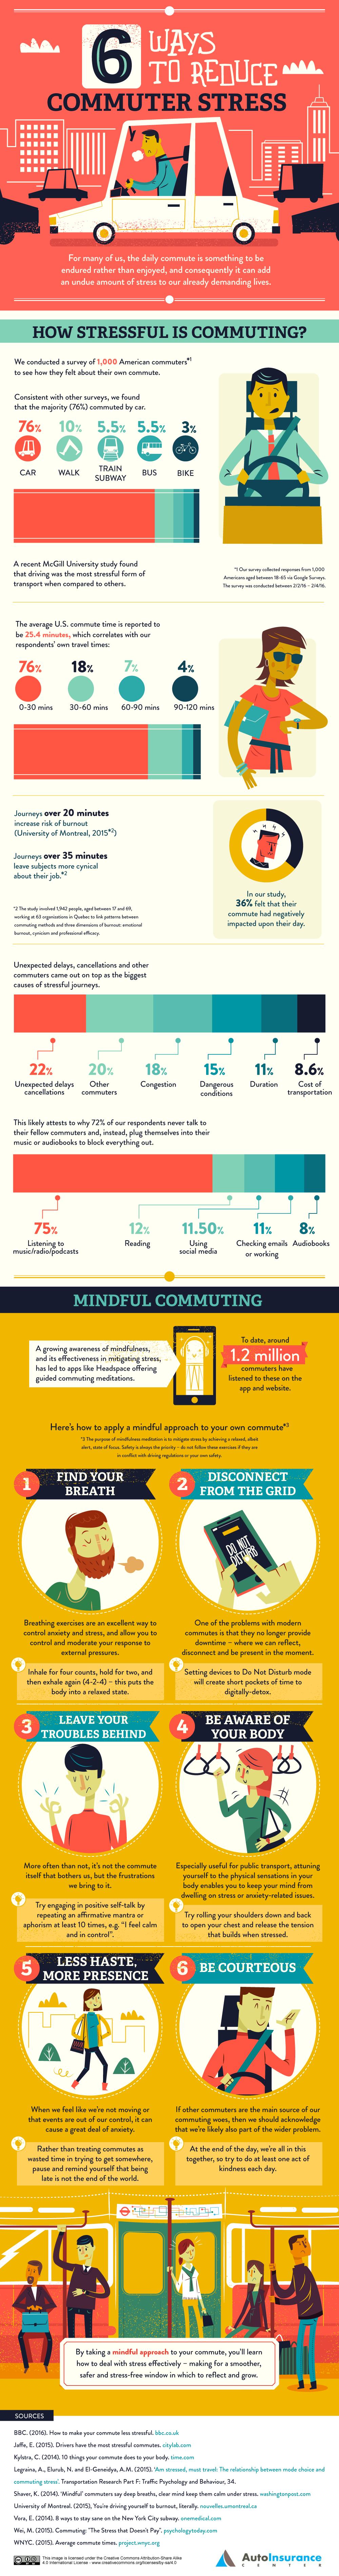 reduce-commuter-stress